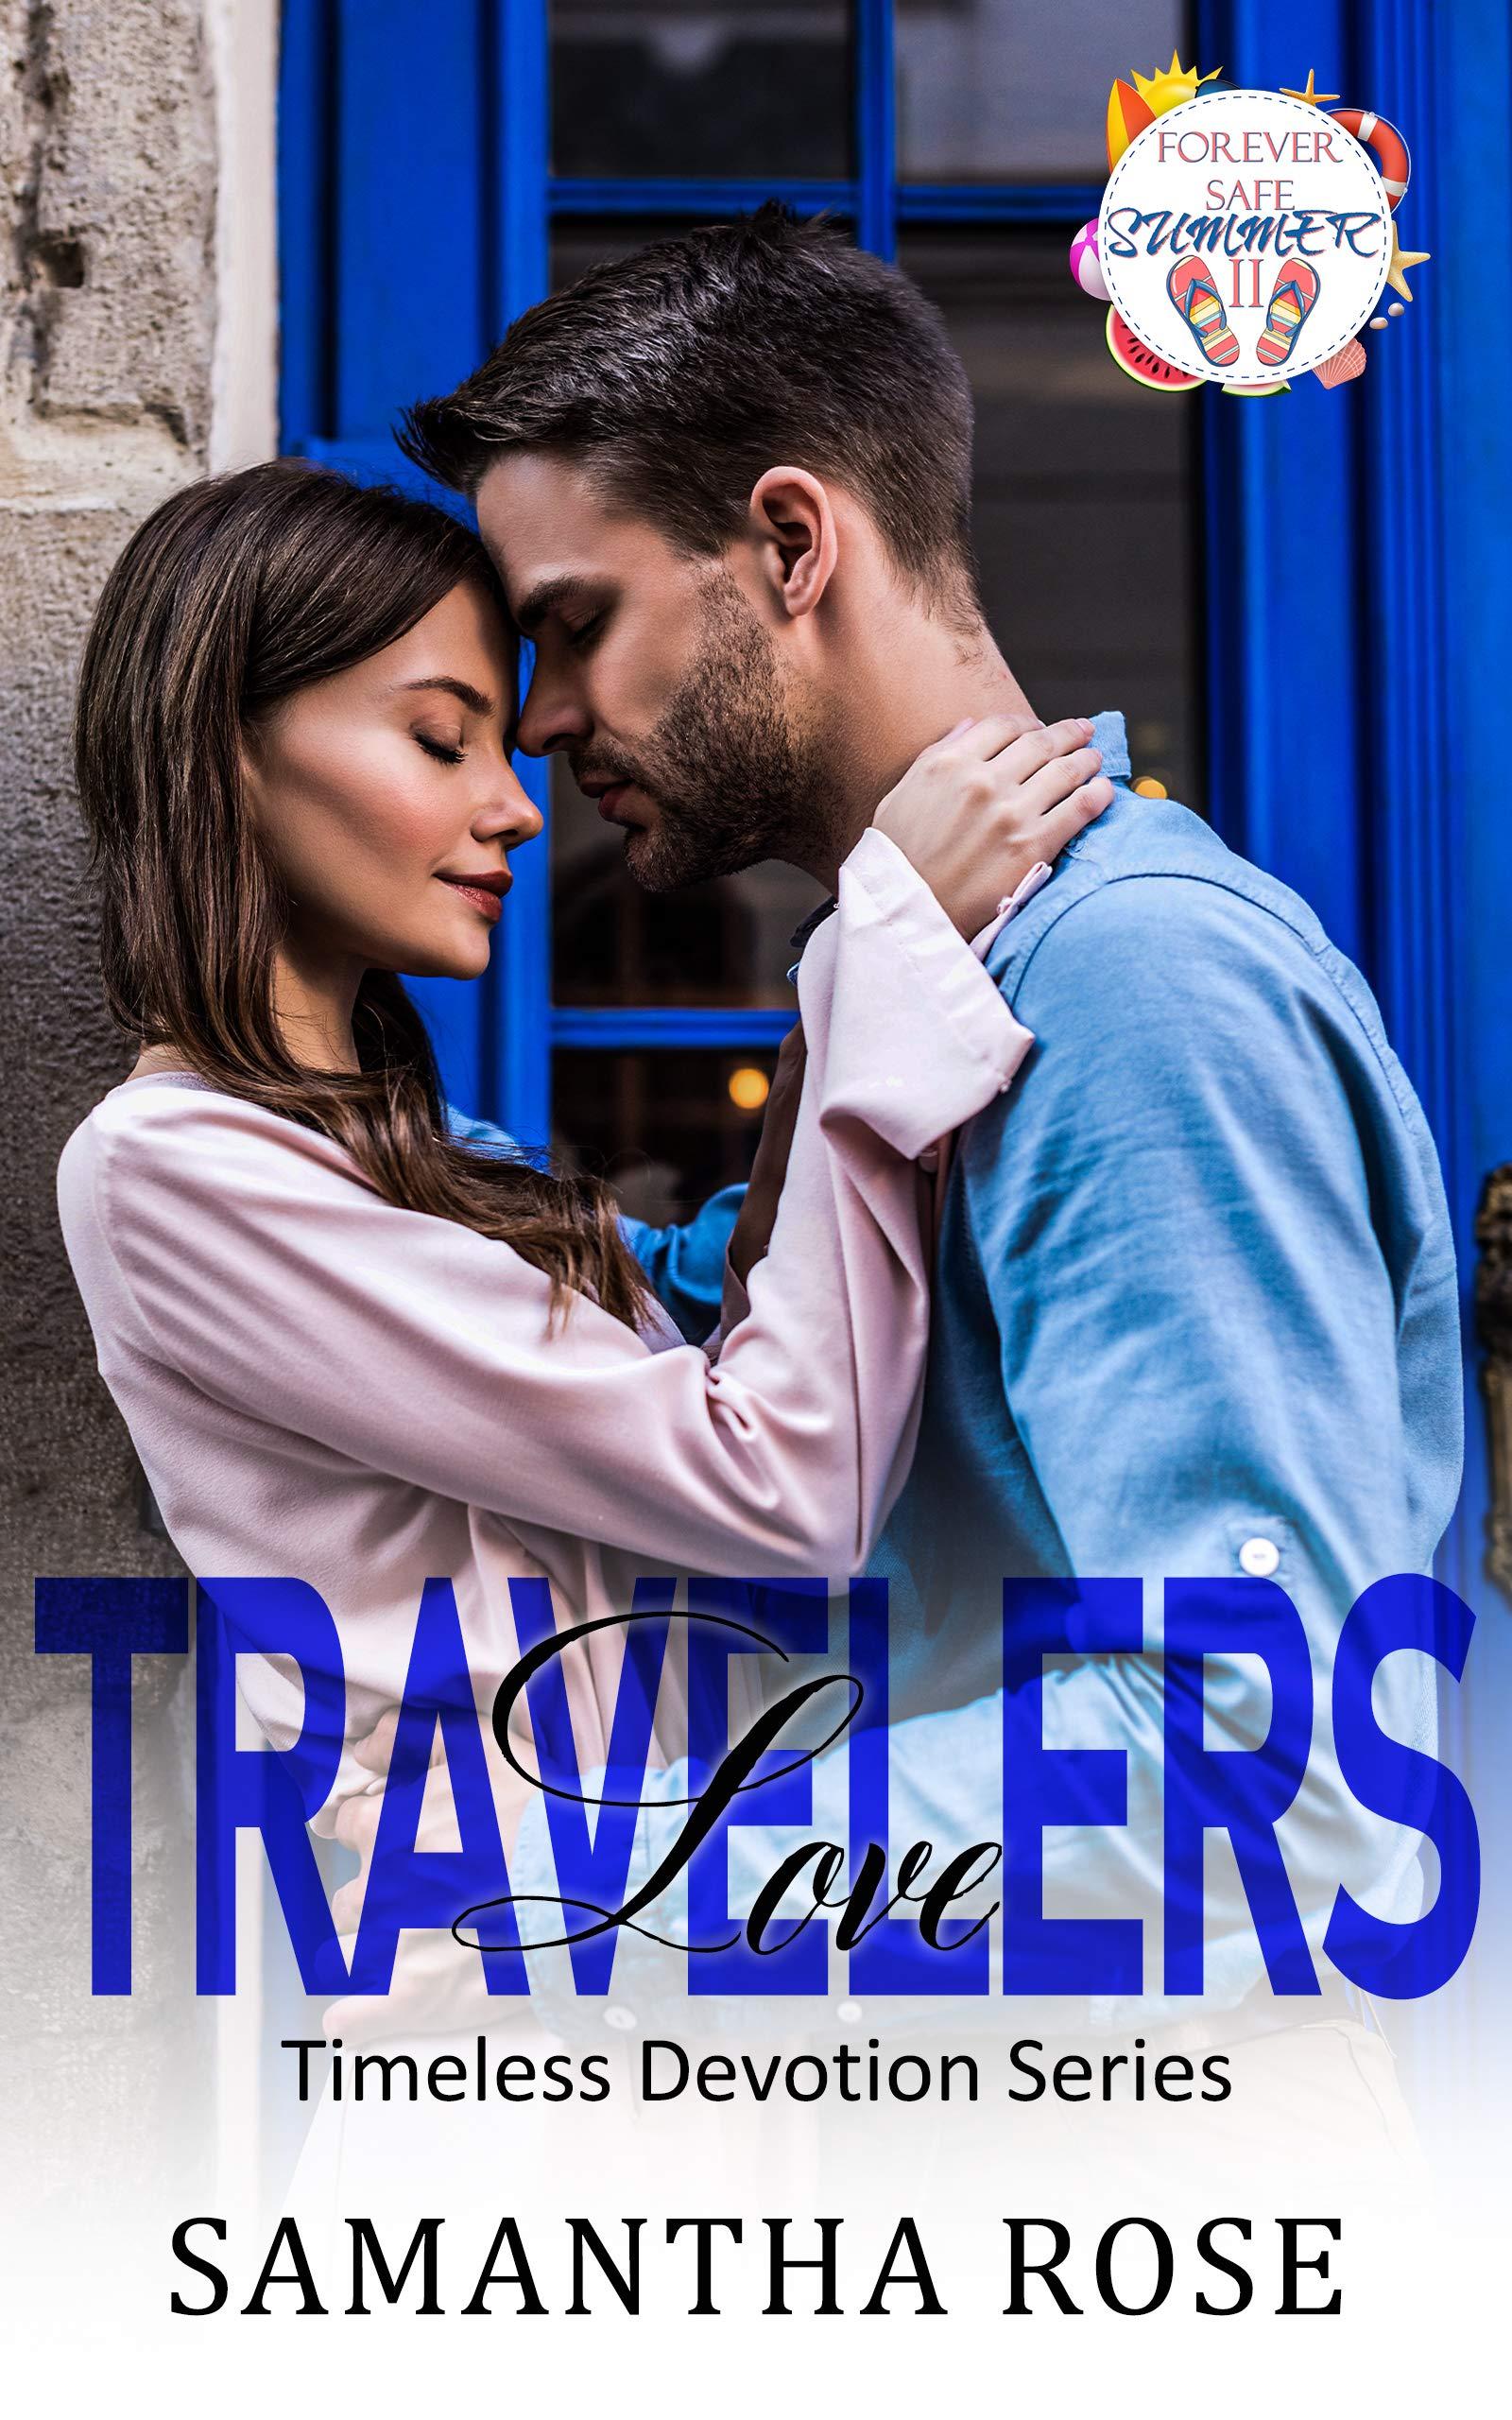 Samantha Rose - Timeless Devotion 4 - Travelers Love